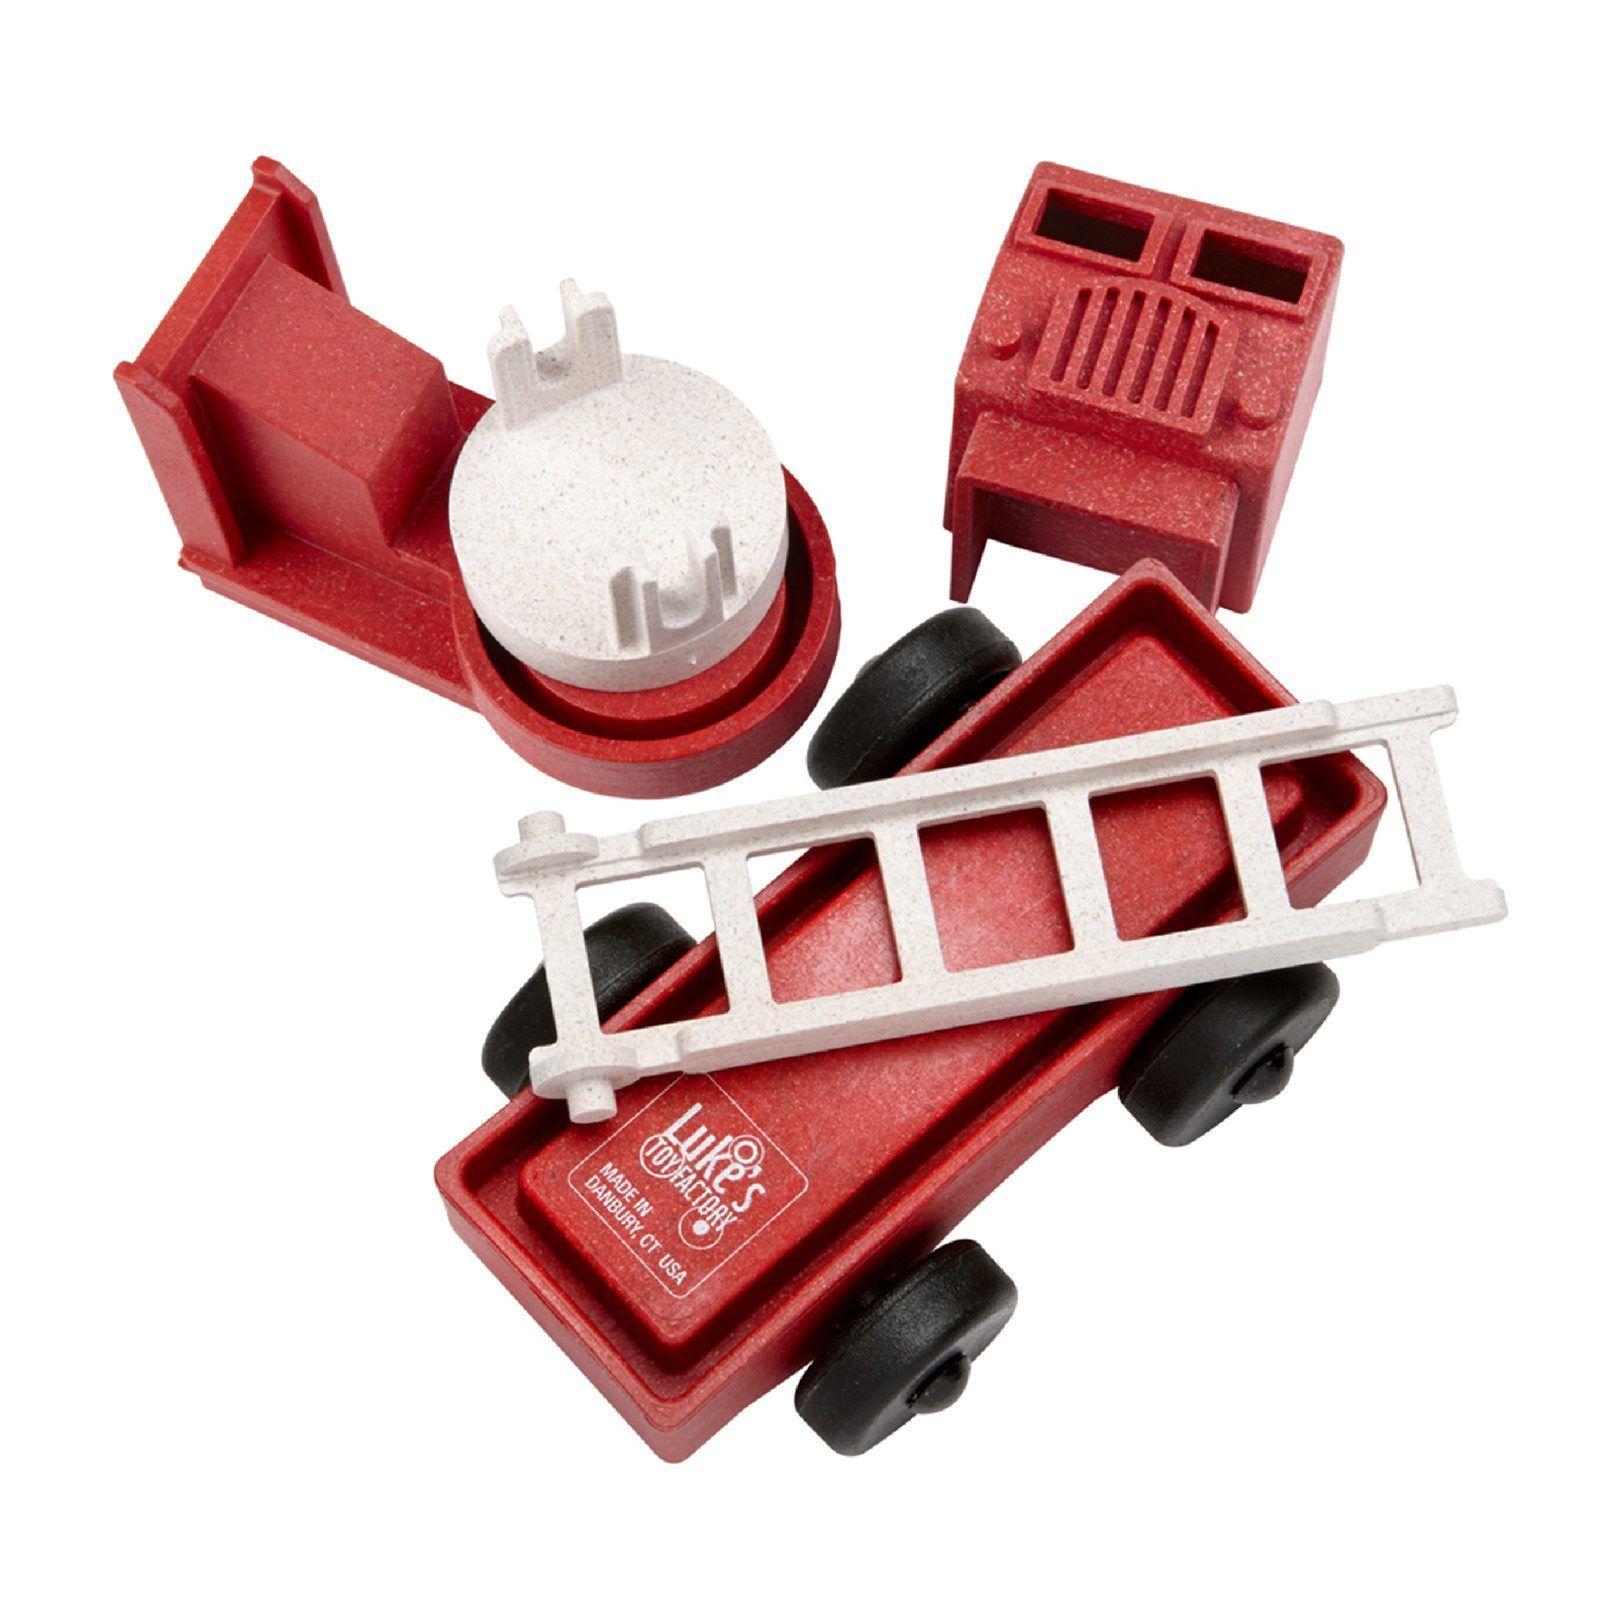 Luke's Toy Factory EcoFire Truck Fine motor skills